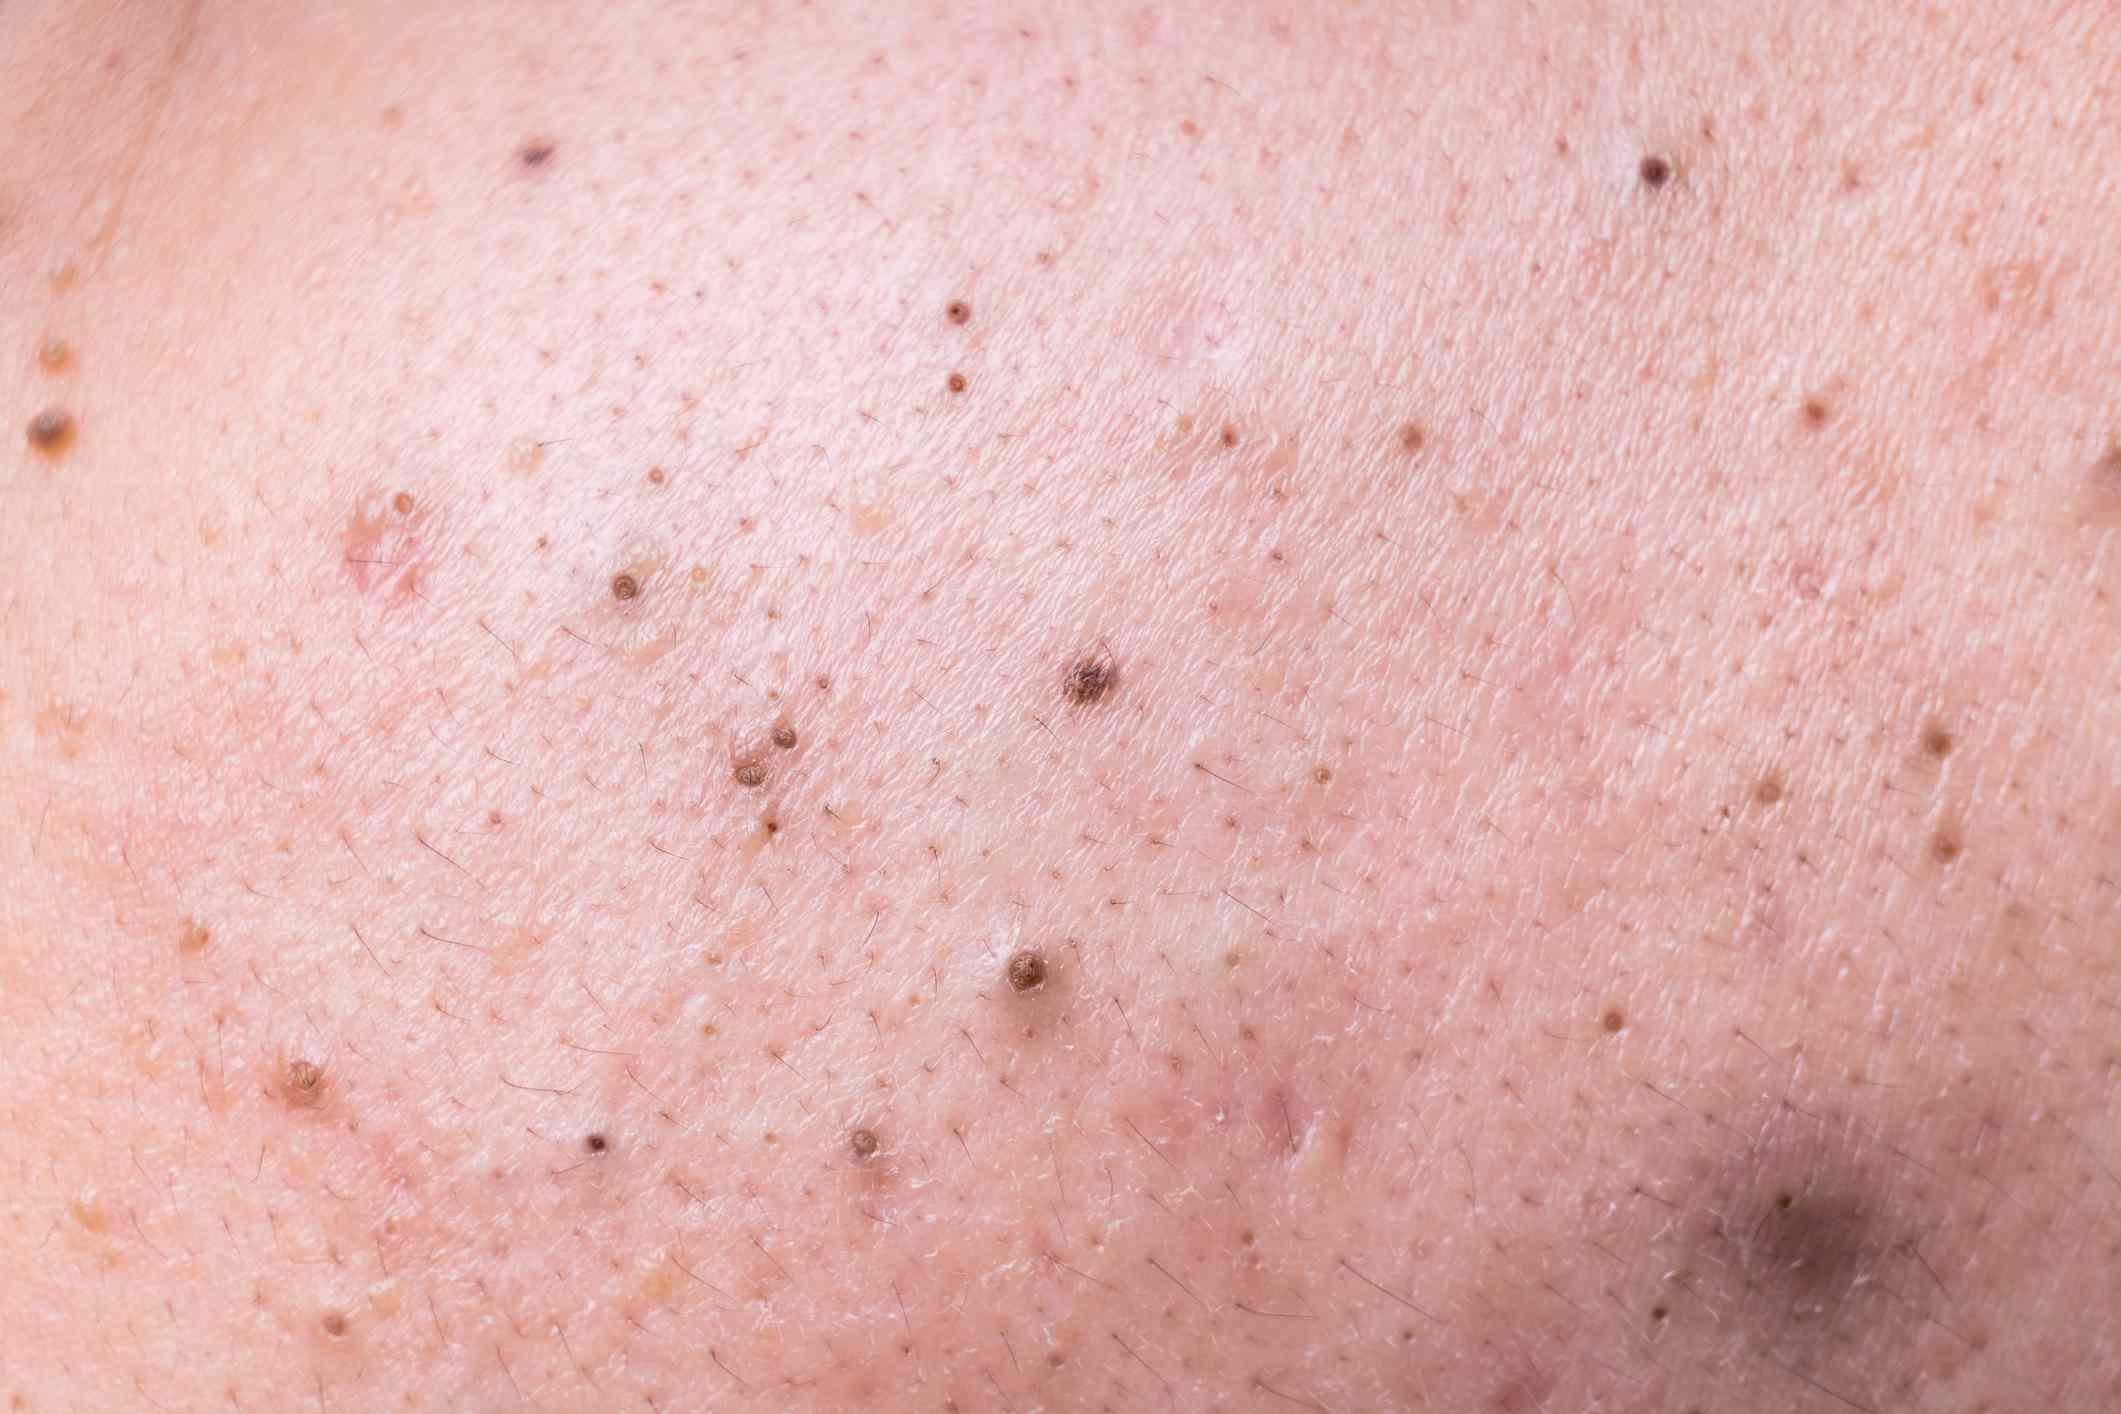 Close up of blackheads on skin.